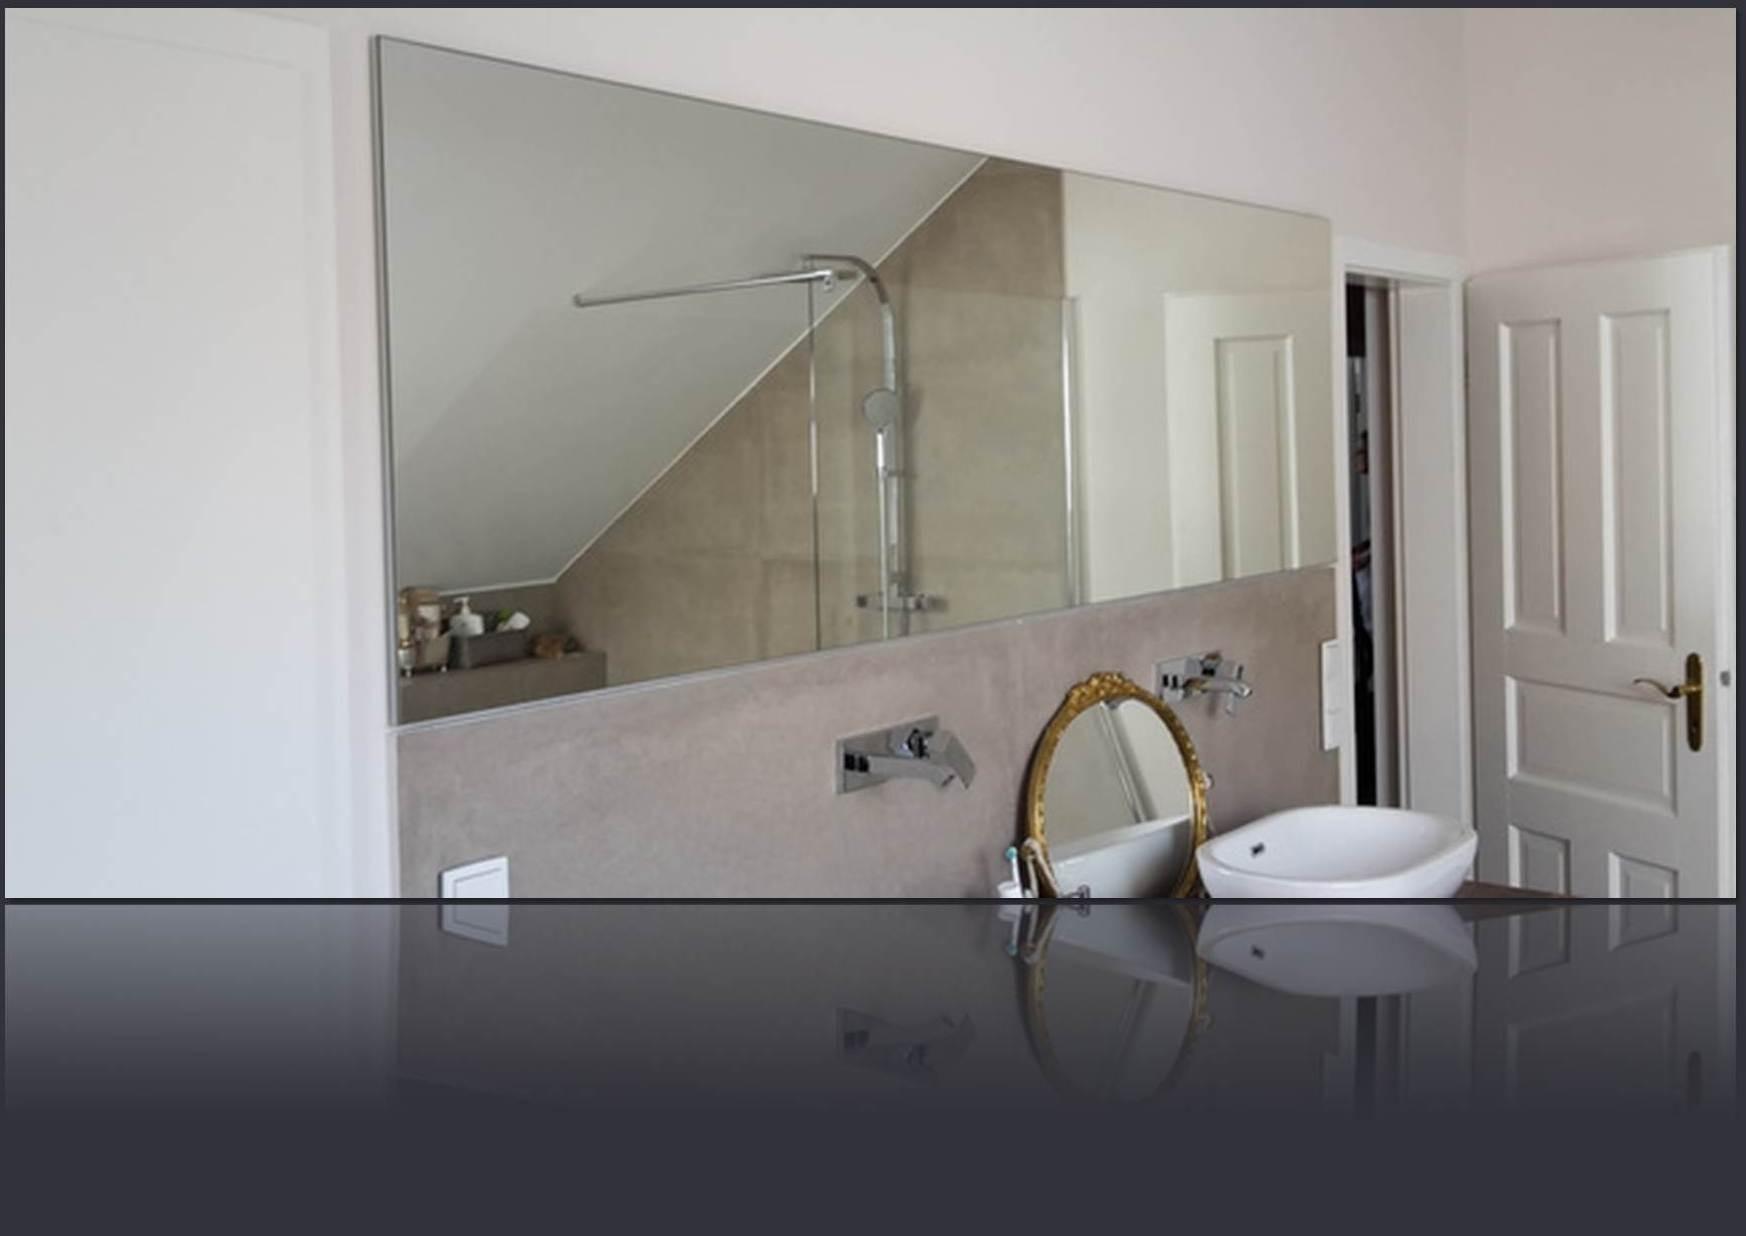 Badspiegel flächenbündig verklebt